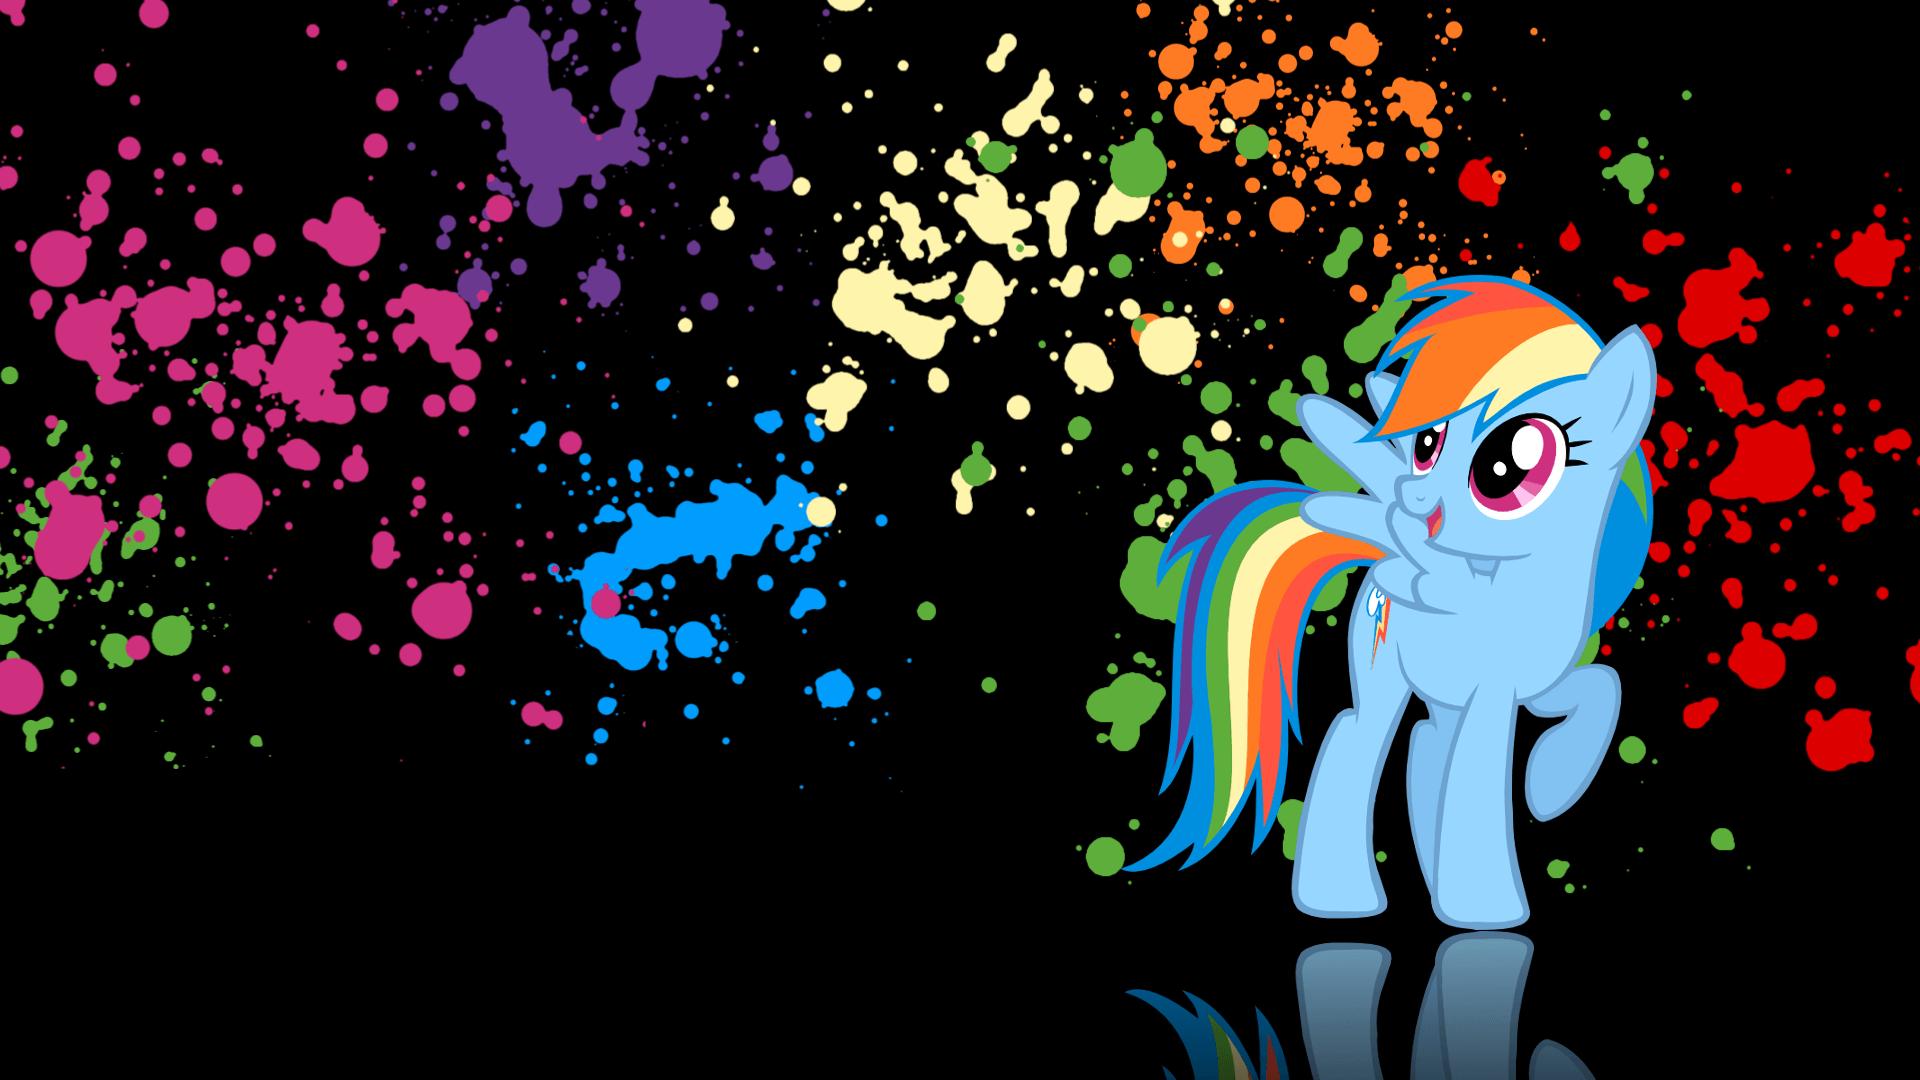 rainbow dash sphere background - photo #34